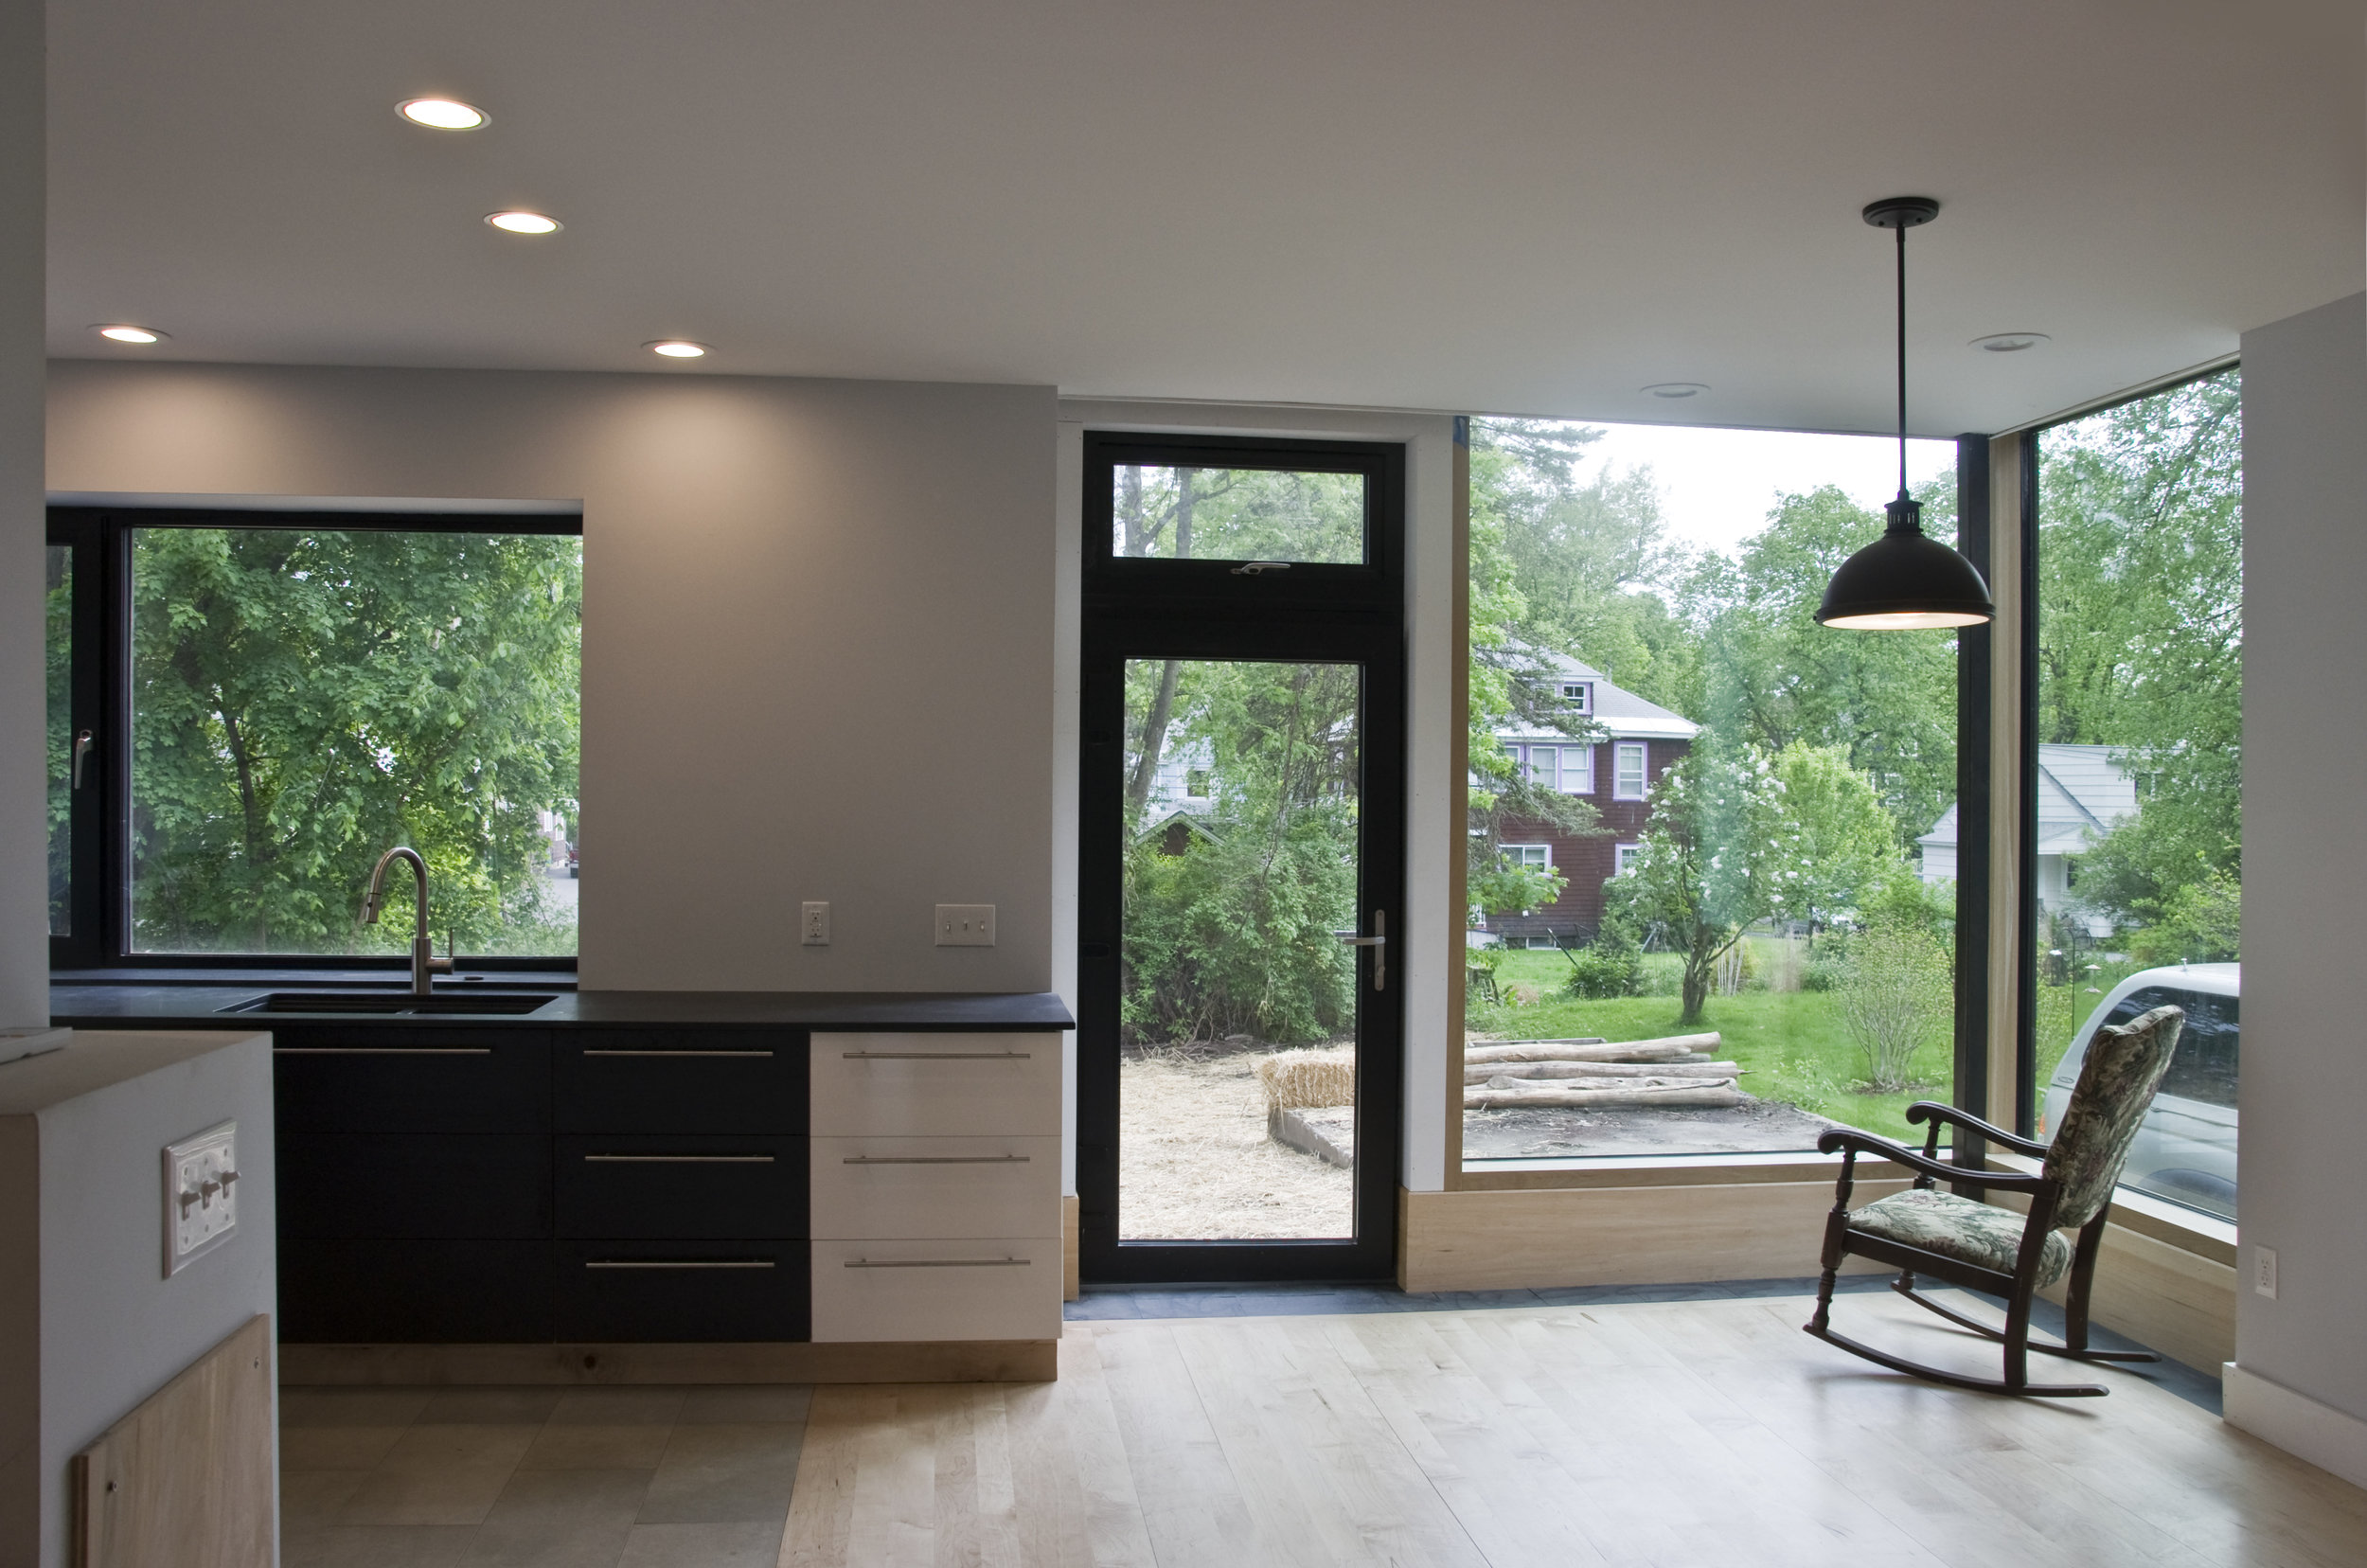 Ikea kitchen and huge triple glazed windows